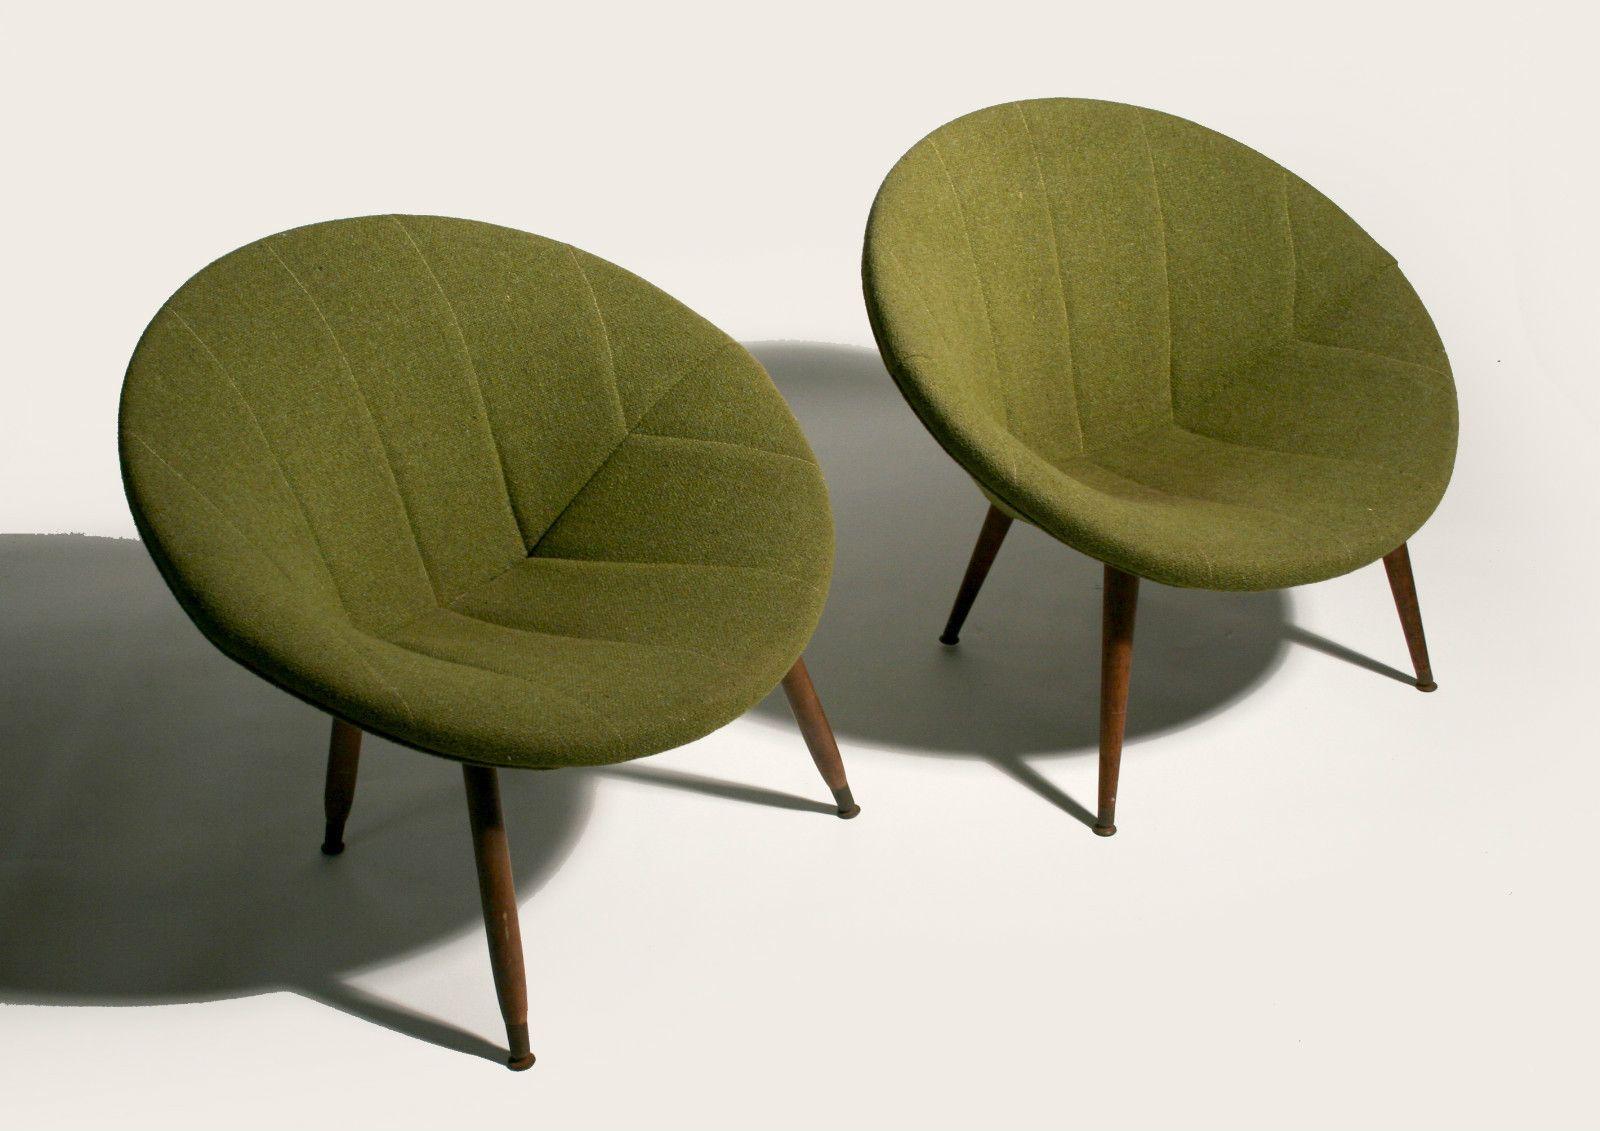 circular lounge chair cosco high cover 50 39s mid century danish modern pod chairs